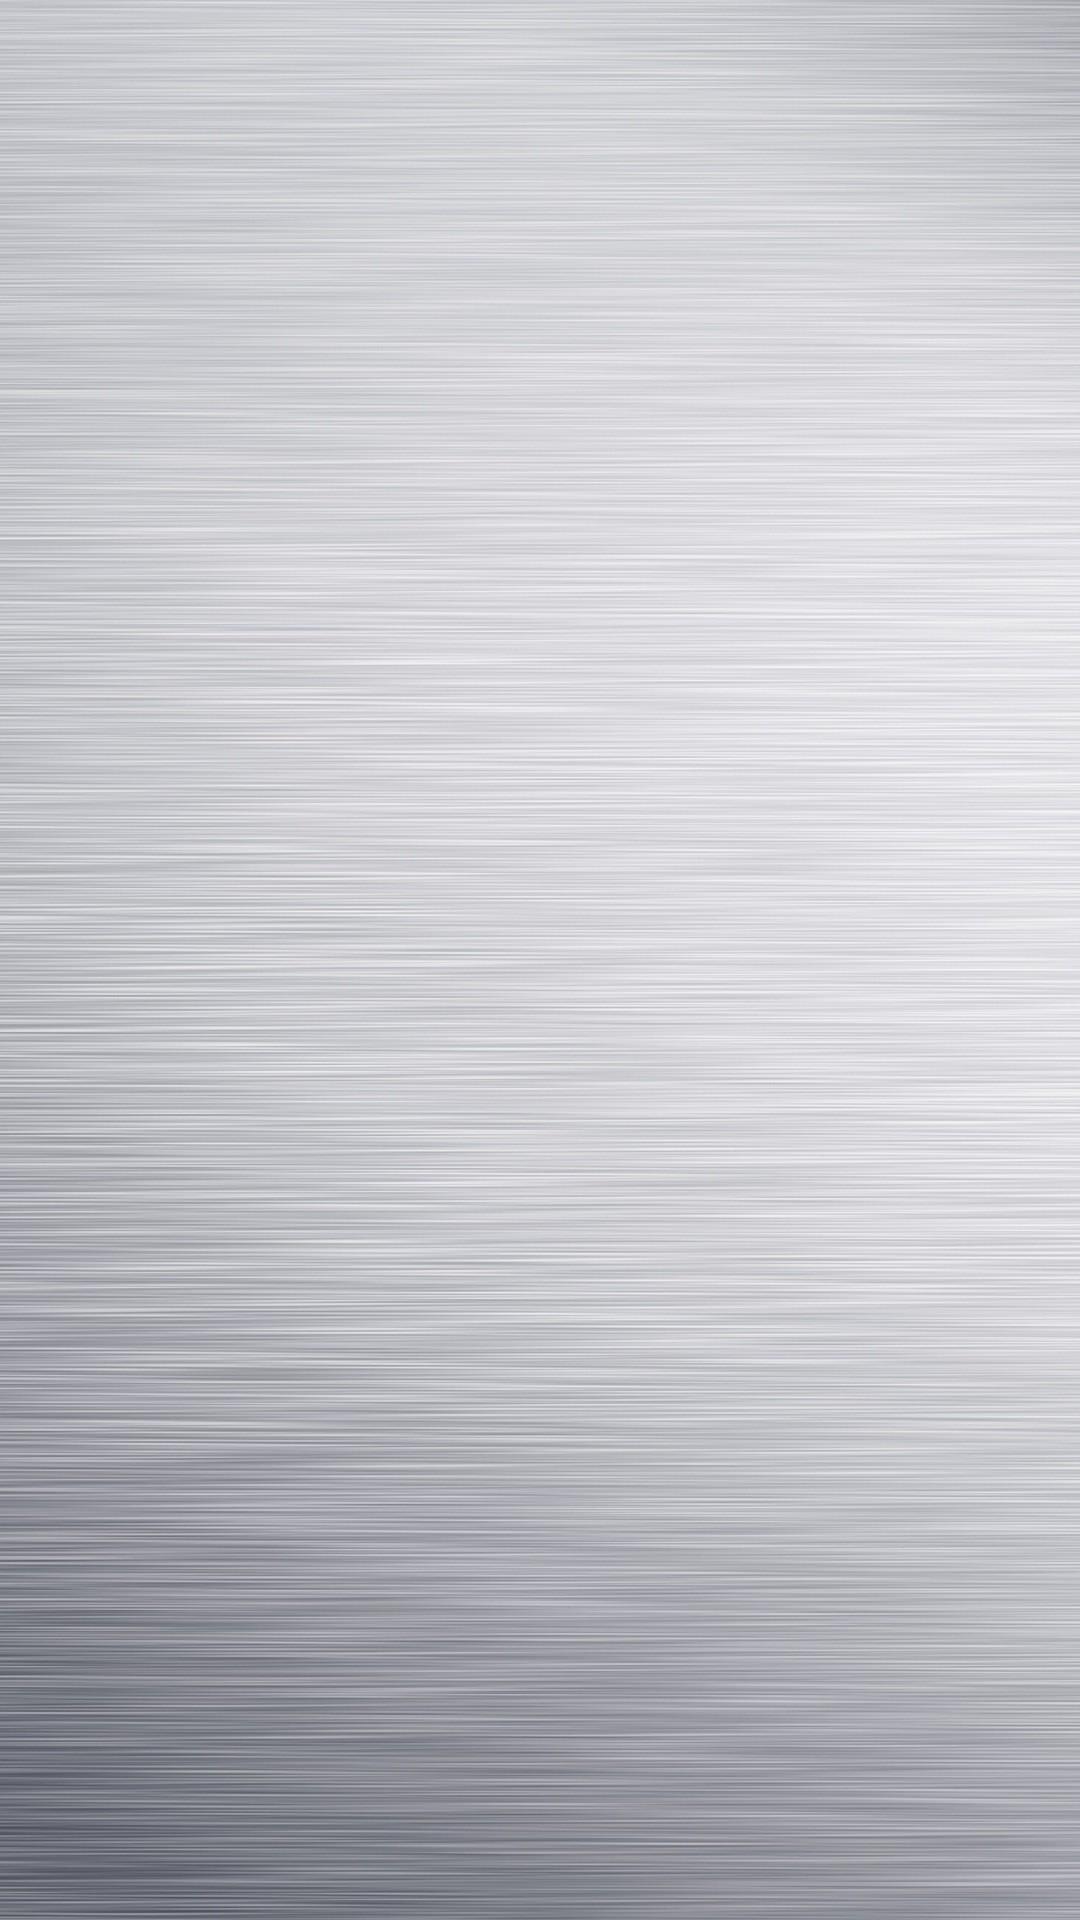 HD Metal Wallpapers Metallic Backgrounds For Free Desktop Download   HD  Wallpapers   Pinterest   Metallic wallpaper, Hd wallpaper and Wallpaper